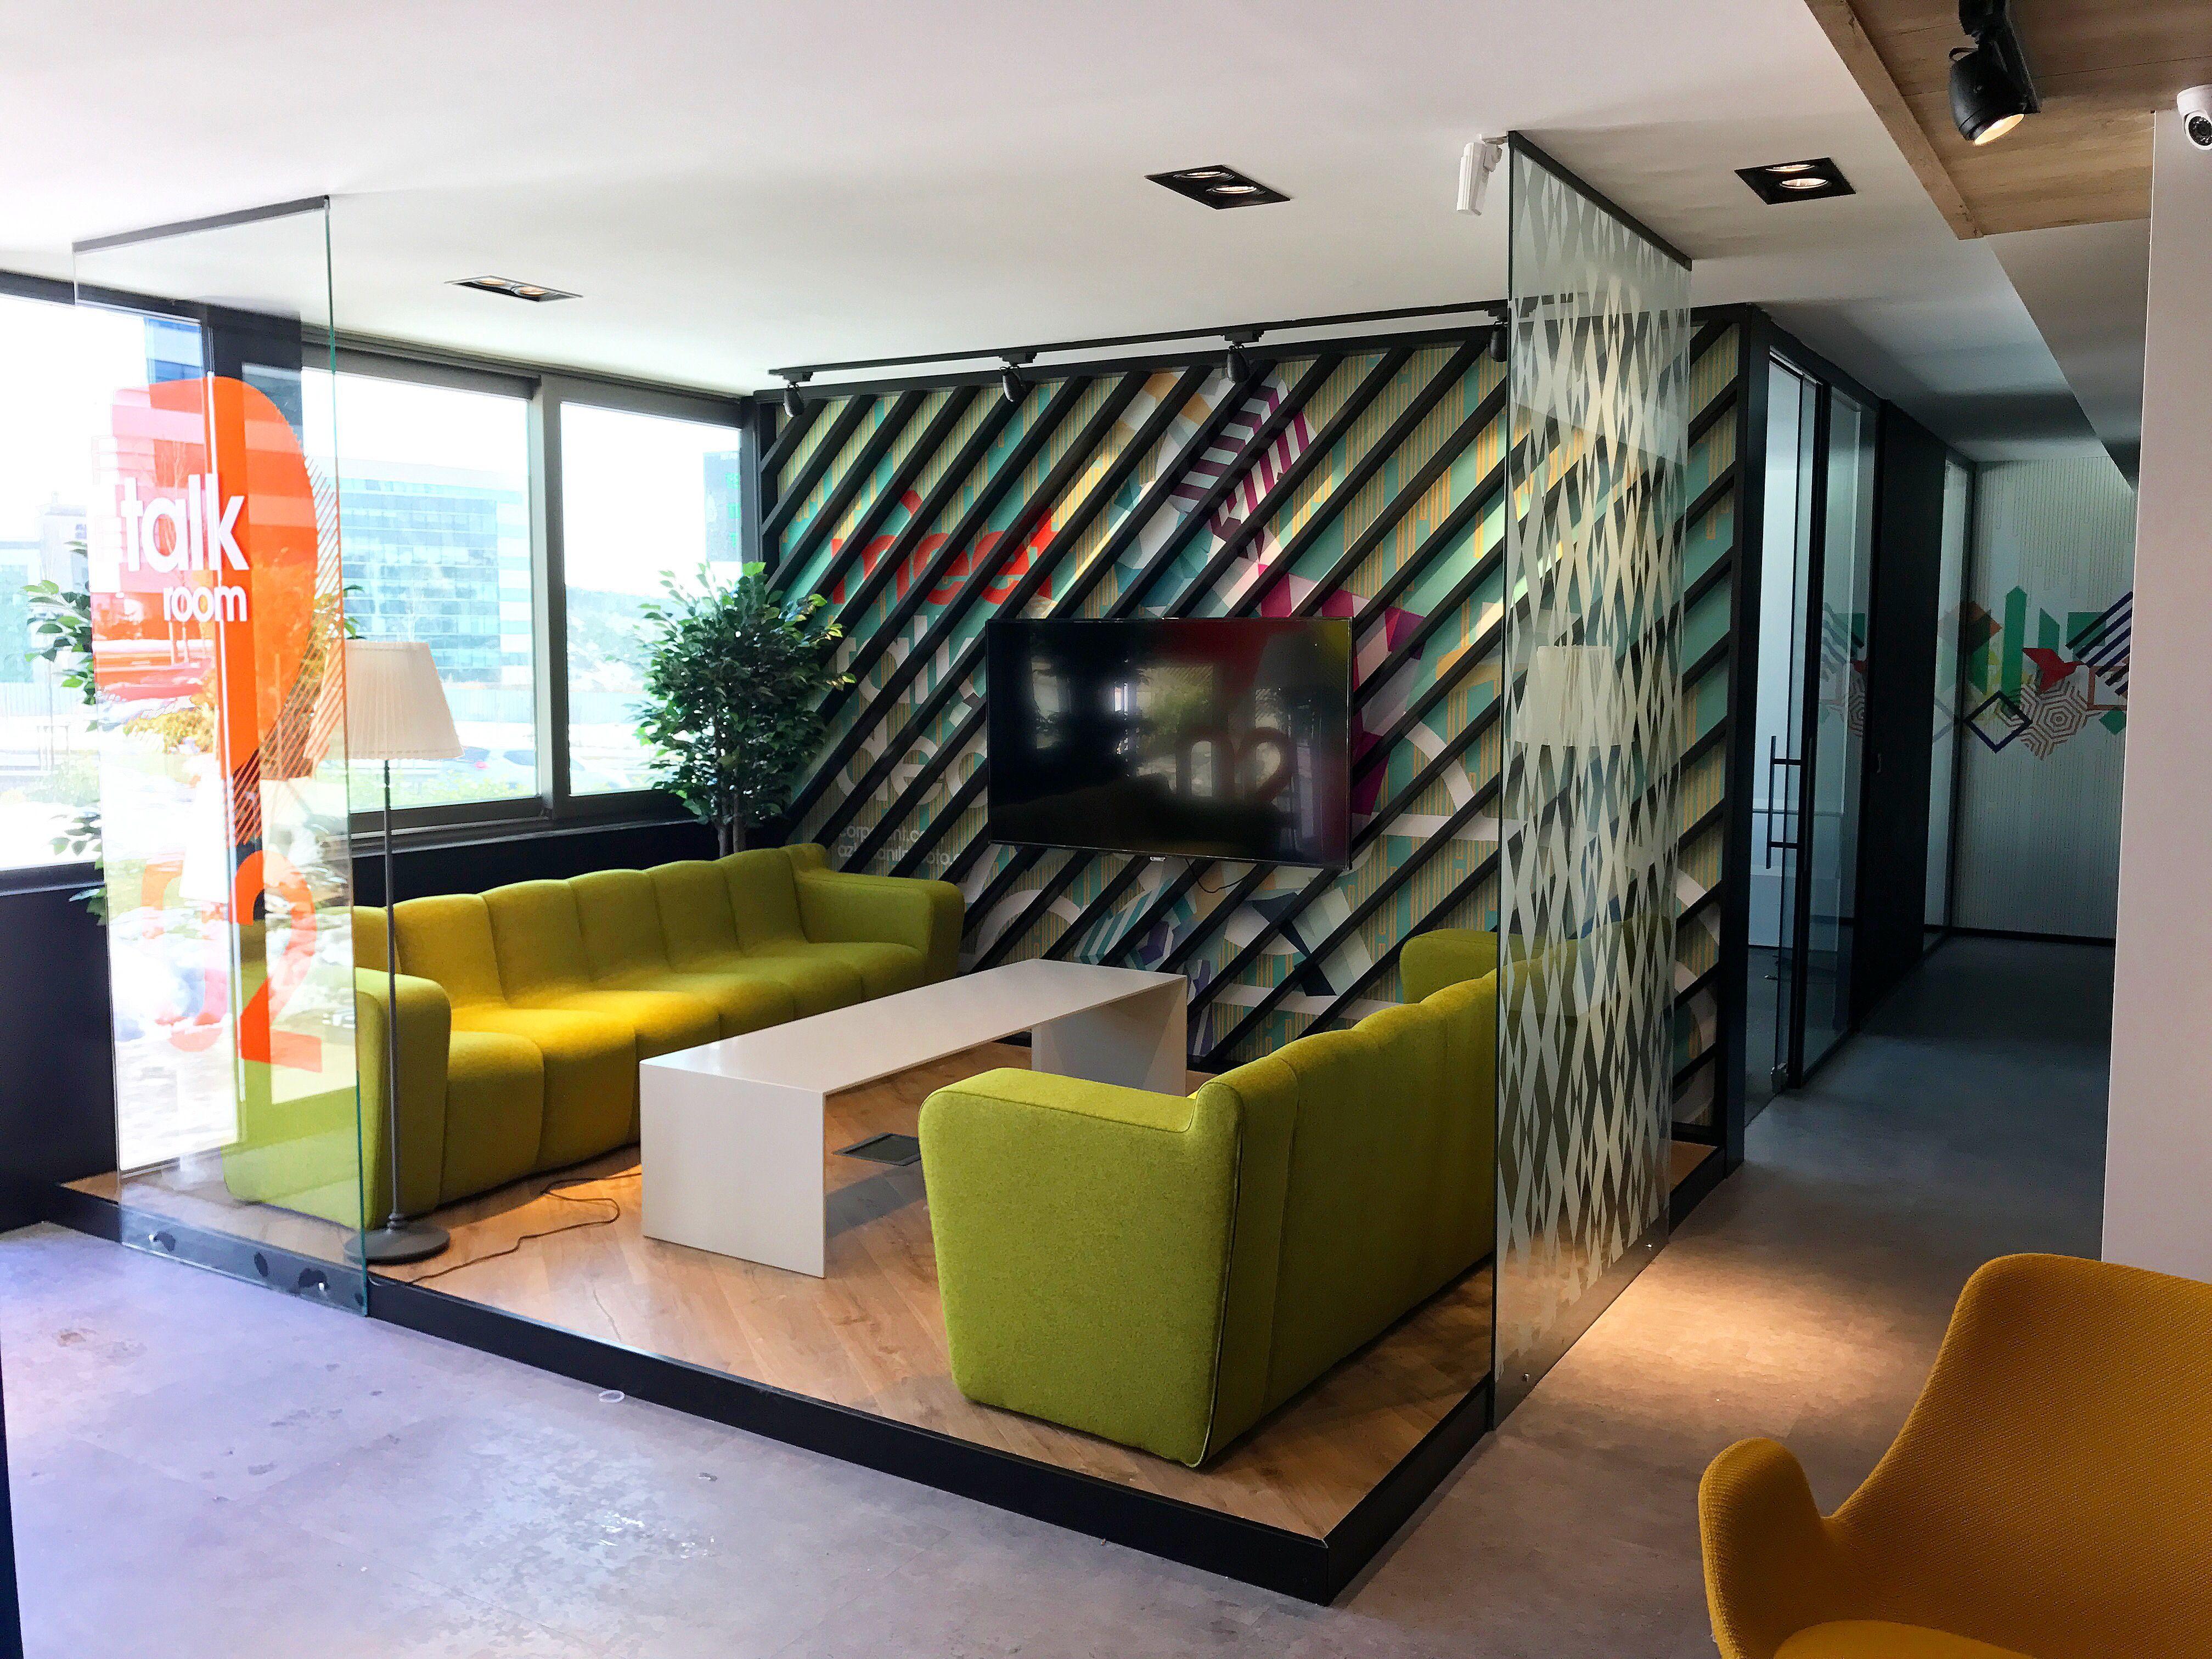 Open Office Talk Room Interior Design By Oa+Design Studio Istanbul